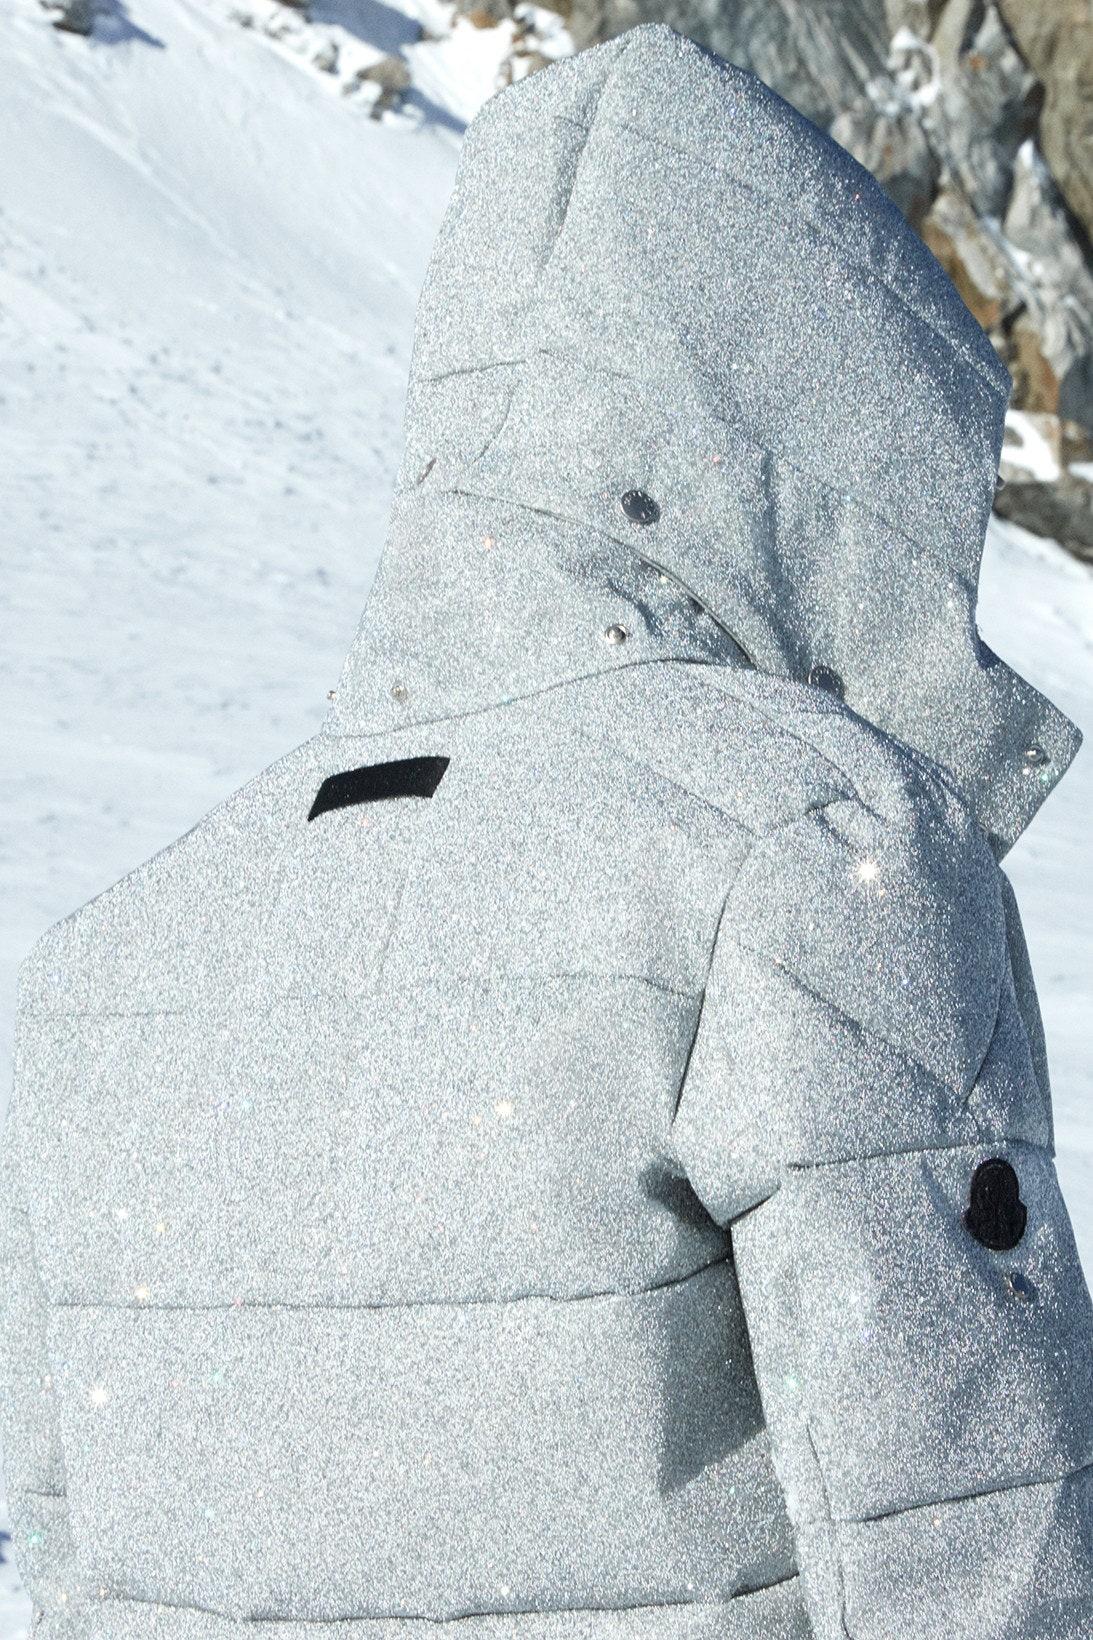 Moncler сделали пуховики в коллаборации с 1017 ALYX 9SM (брендом Мэтью Уильямса)